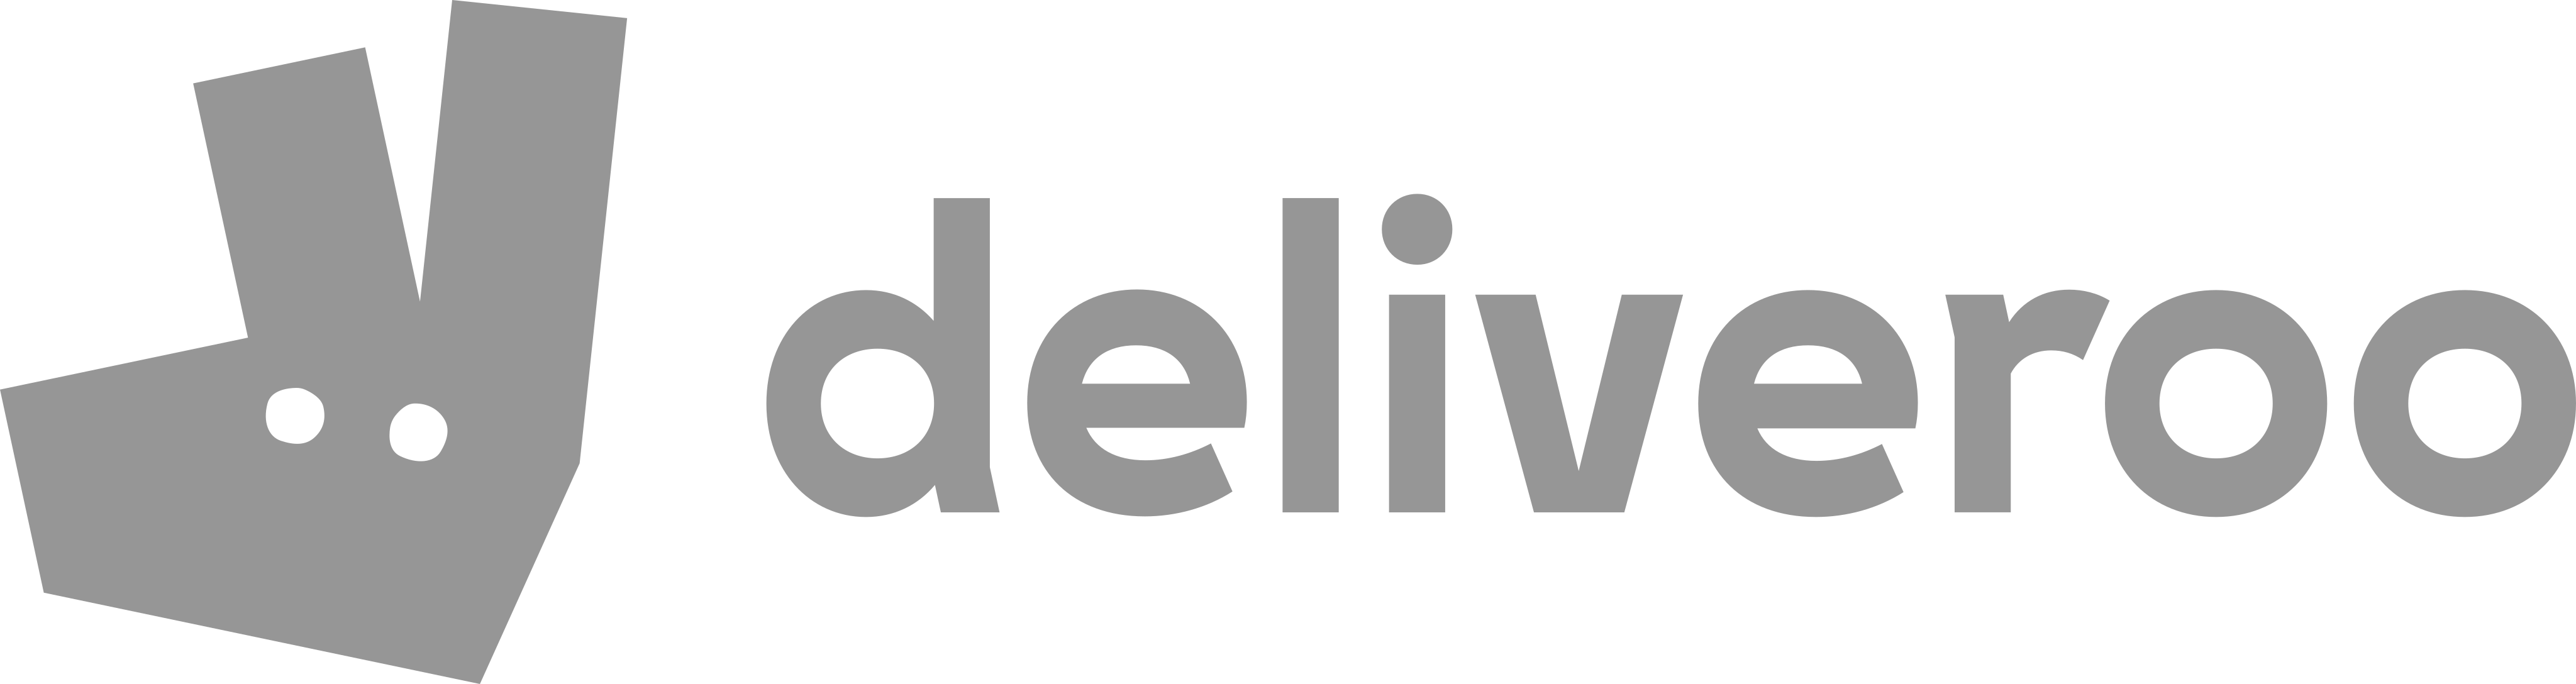 Deliver logo white